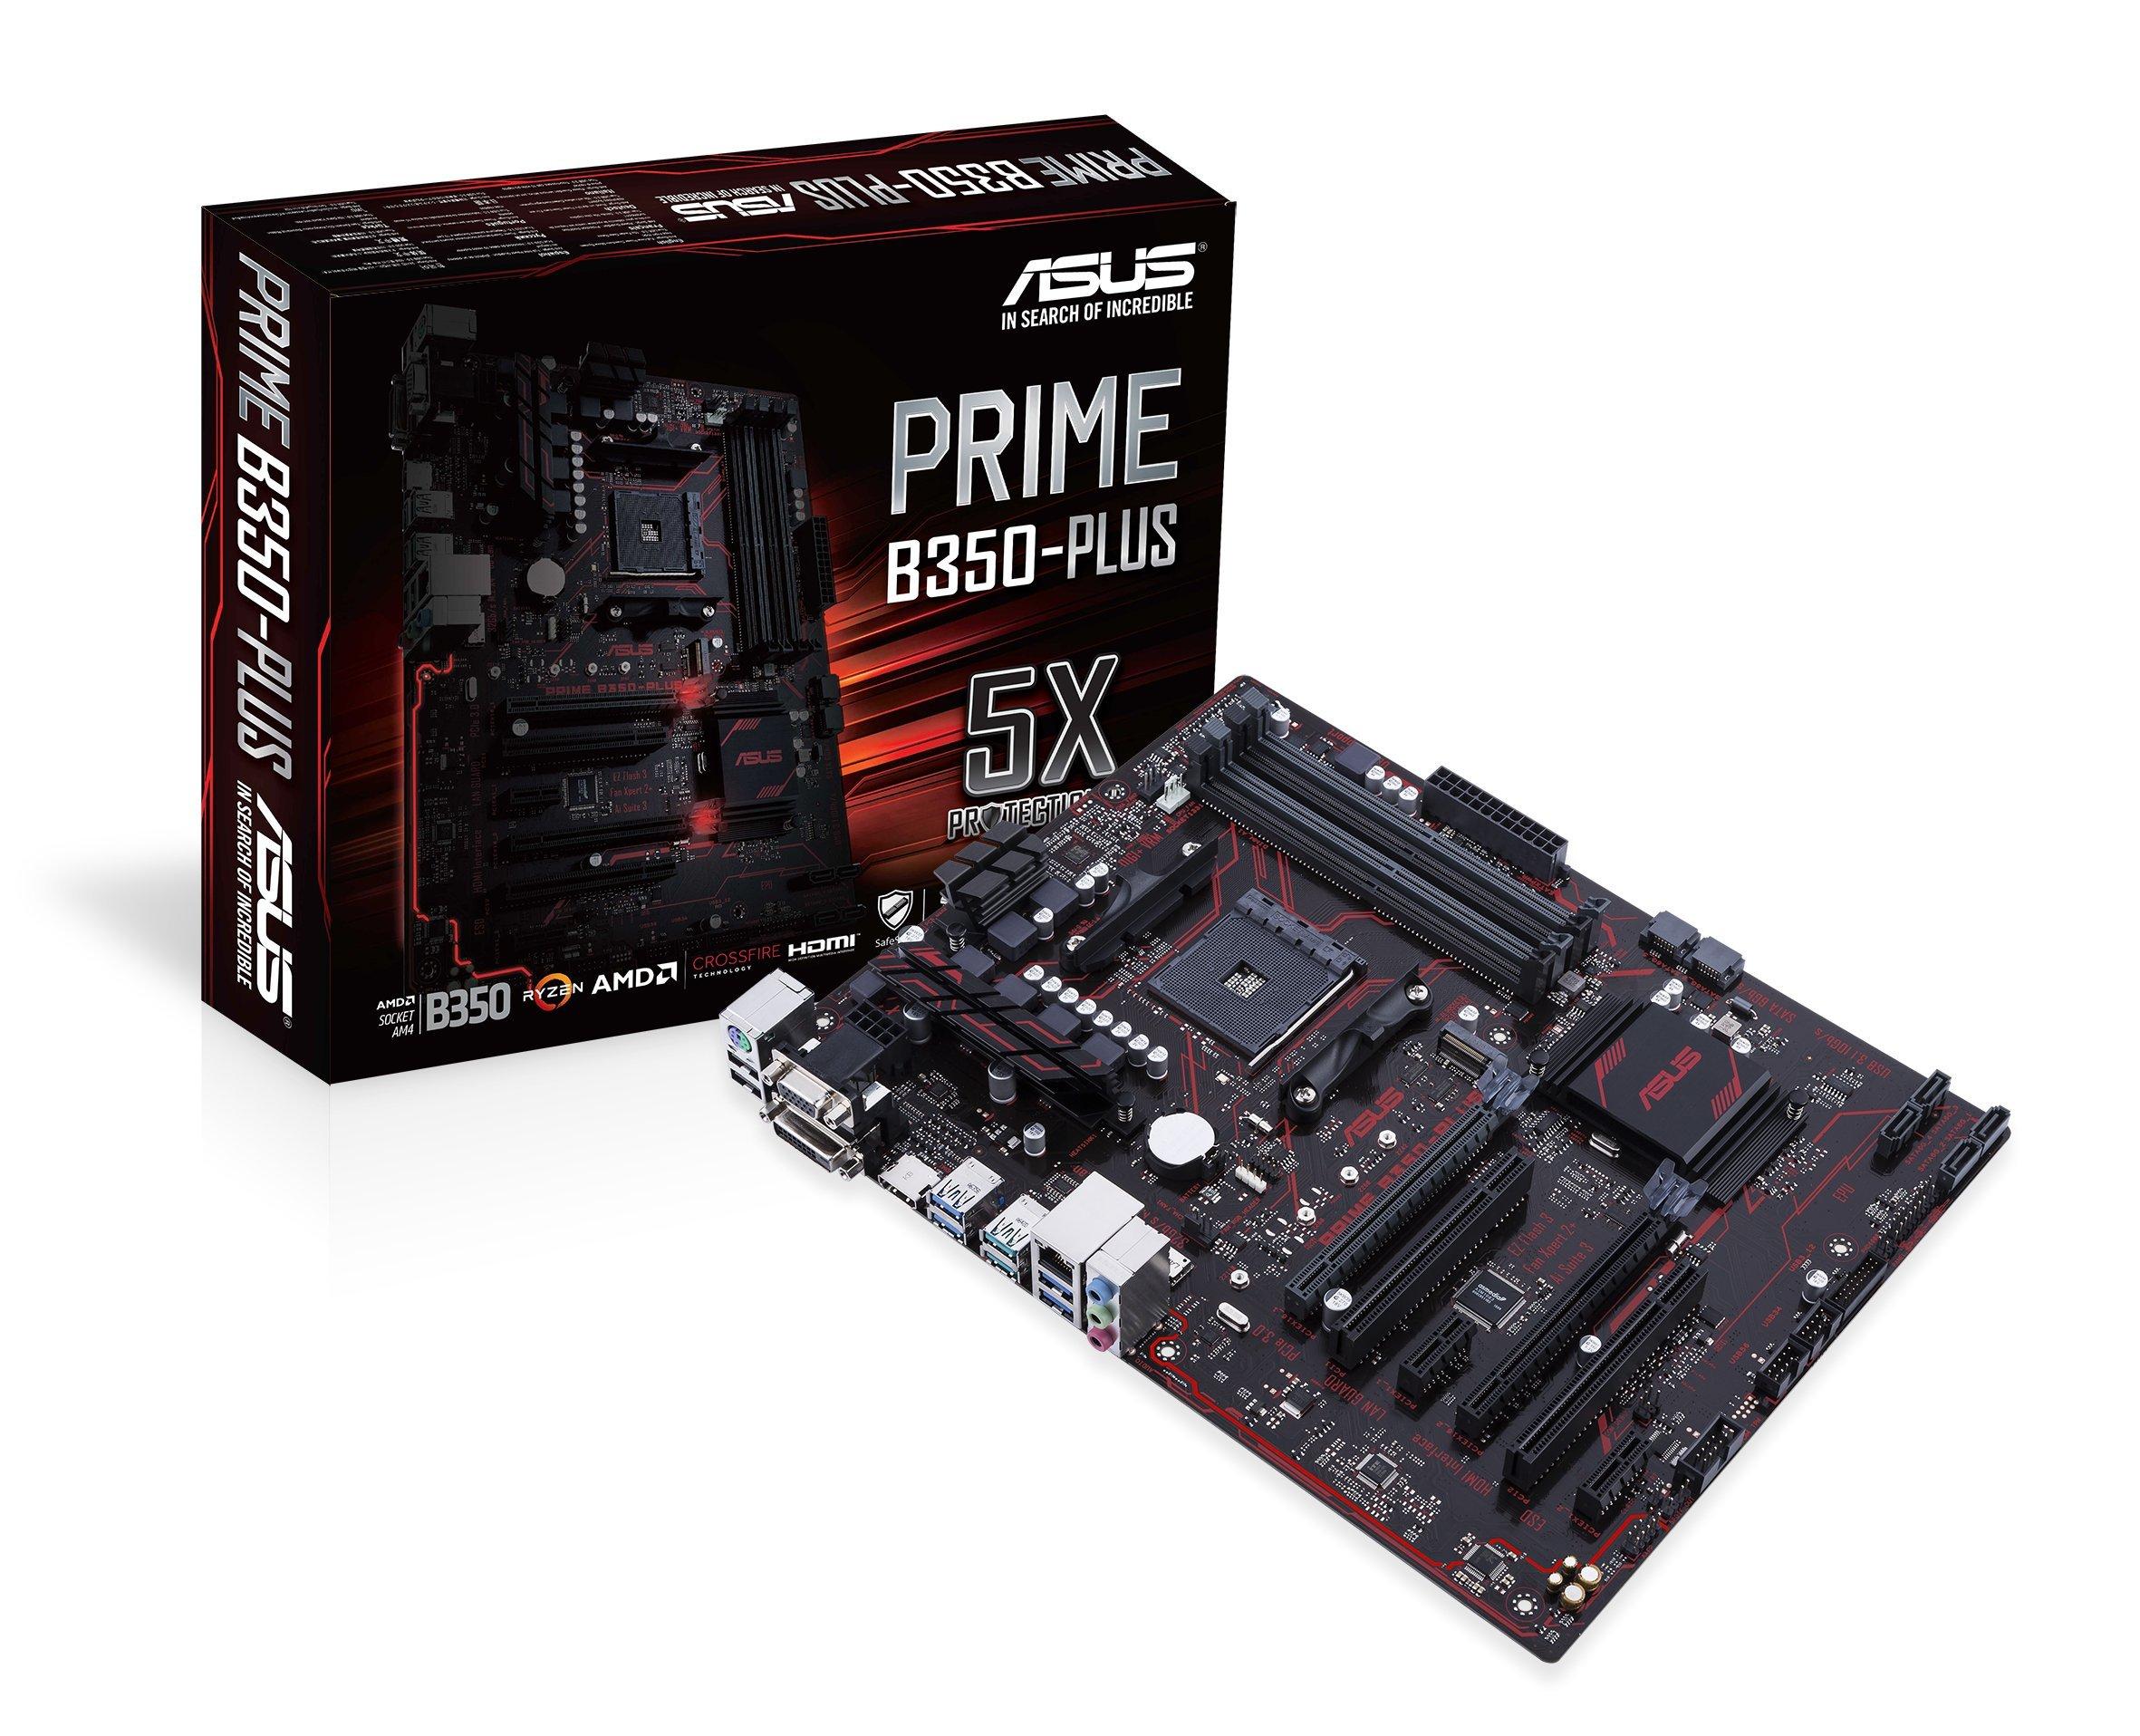 ASUS Prime B350-Plus AMD Ryzen AM4 DDR4 HDMI DVI VGA M.2 USB 3.1 ATX B350 Motherboard by Asus